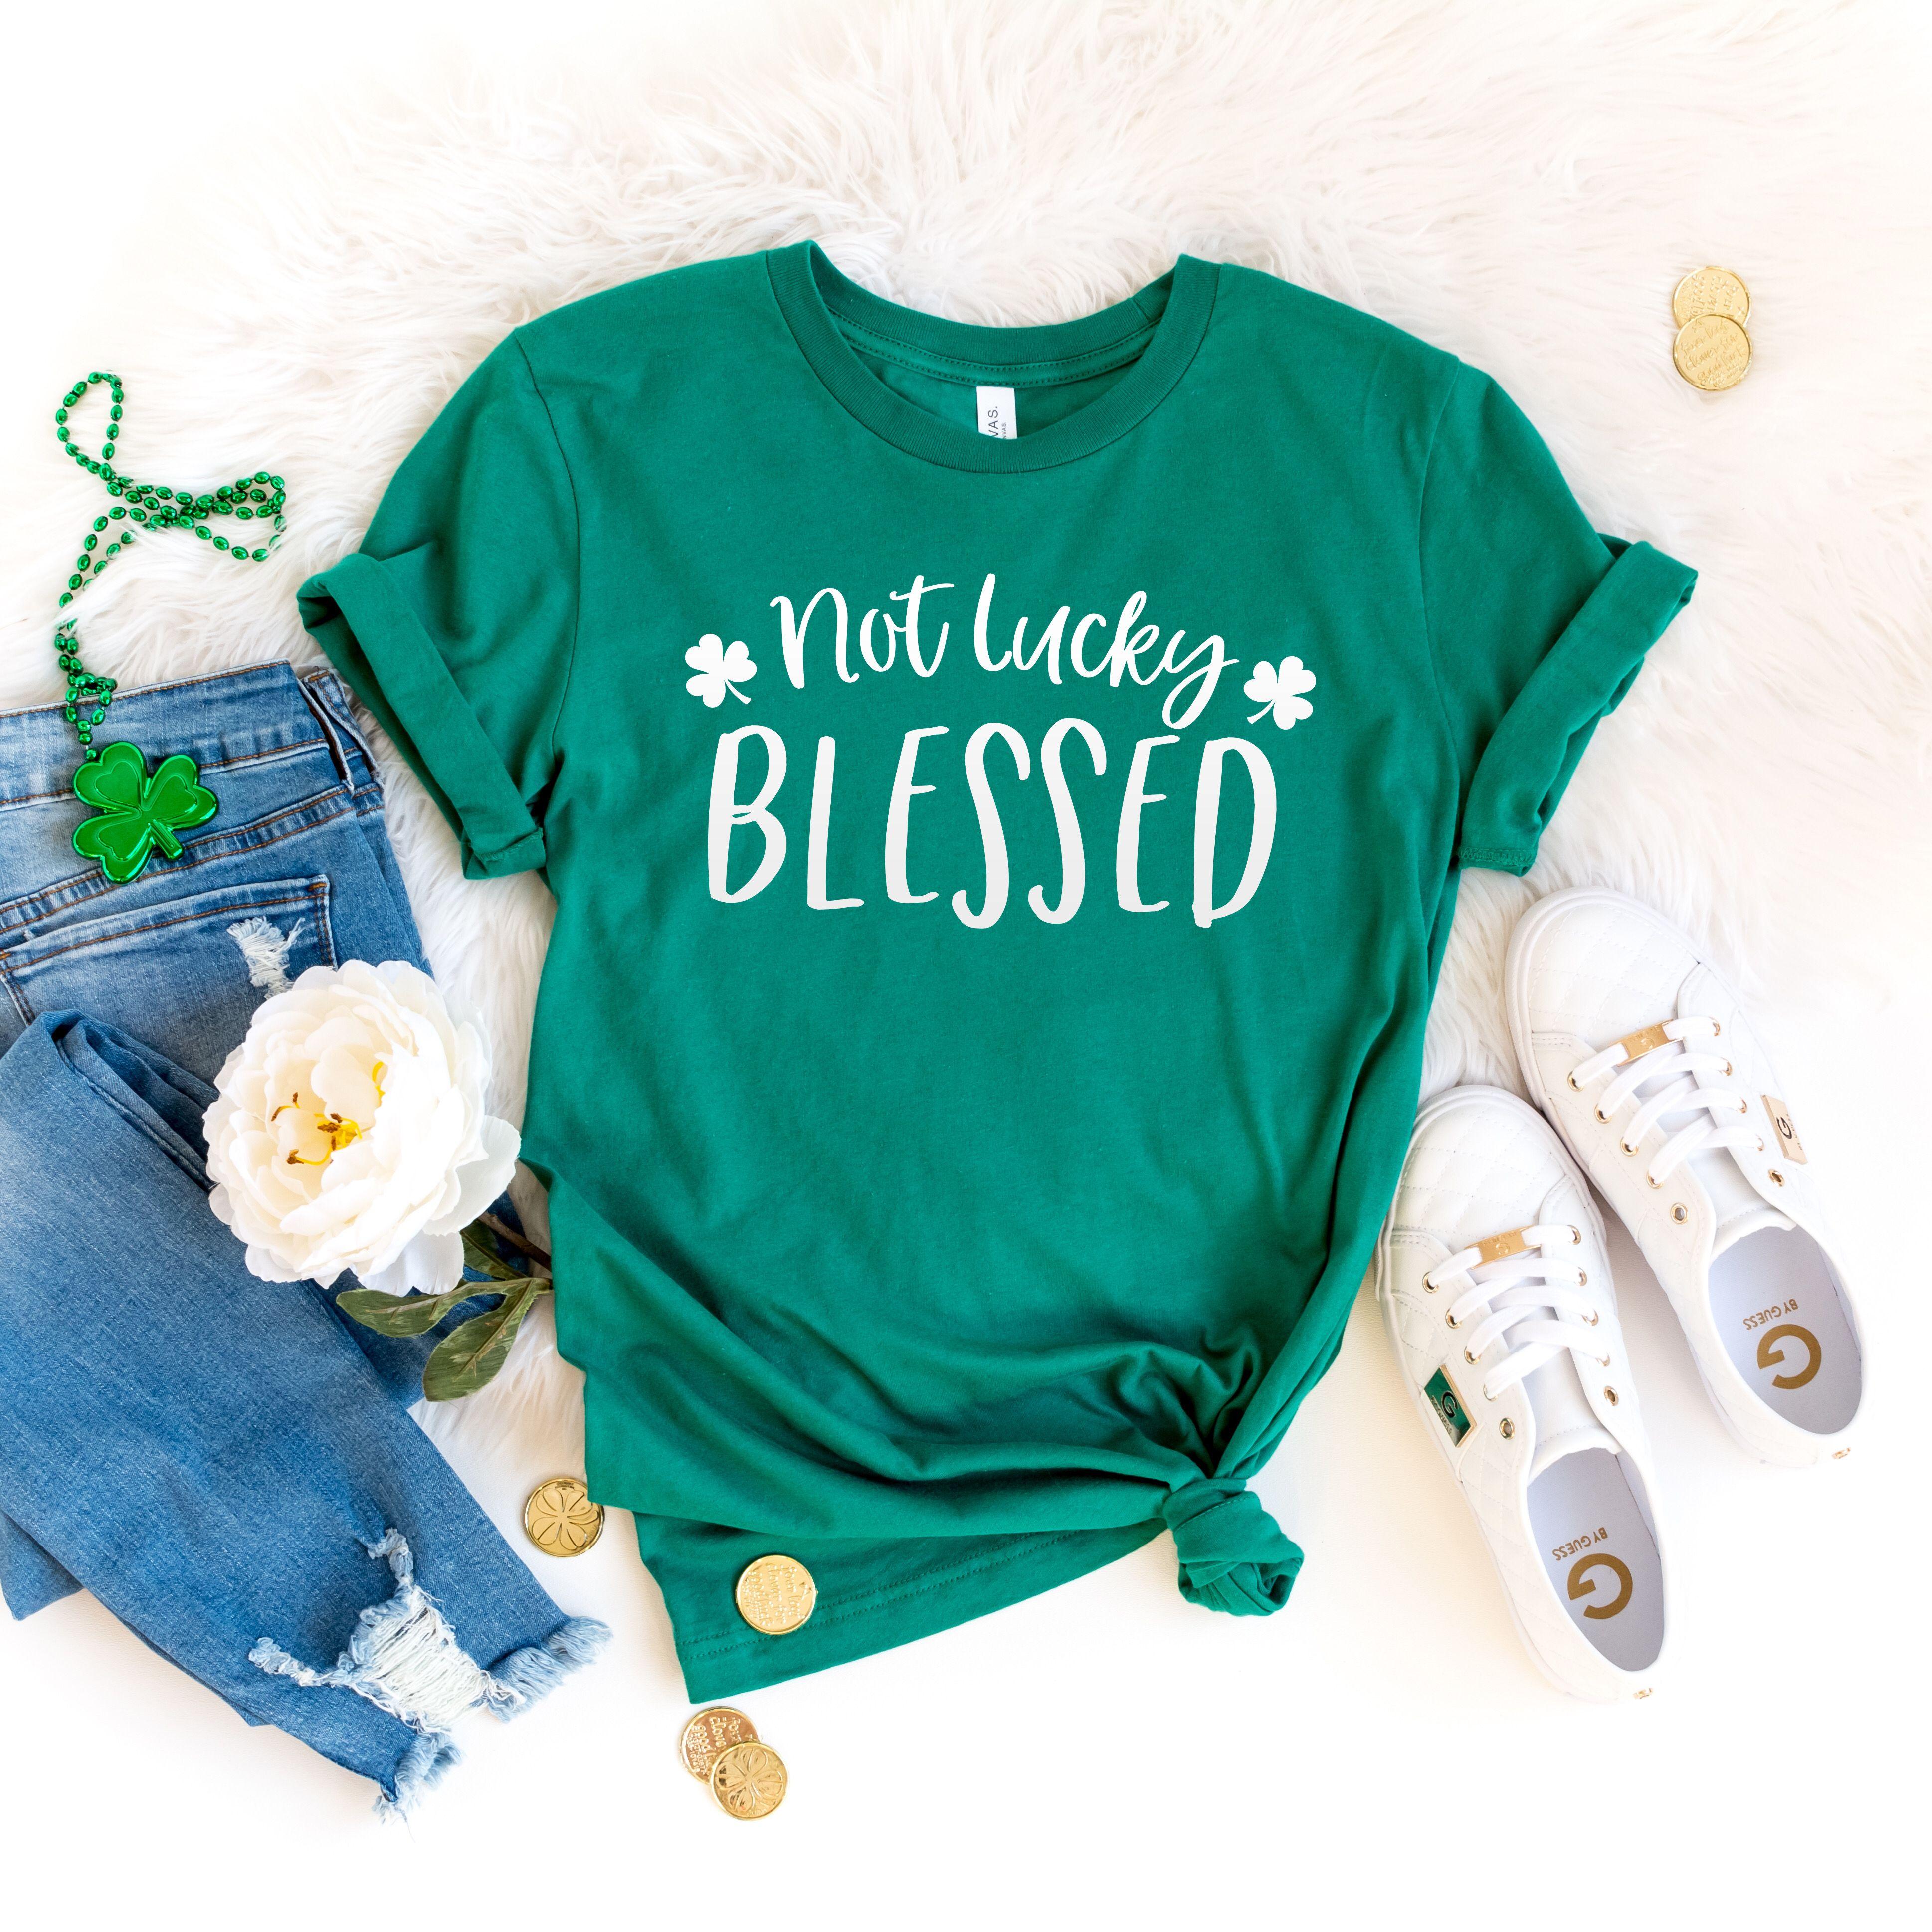 Patty/'s Day Shirts for Men and Women St Patty/'s Lucky Shirt Shamrock Shirt Lucky Shirt Irish Shirt St St Patty/'s Lucky Women Shirt